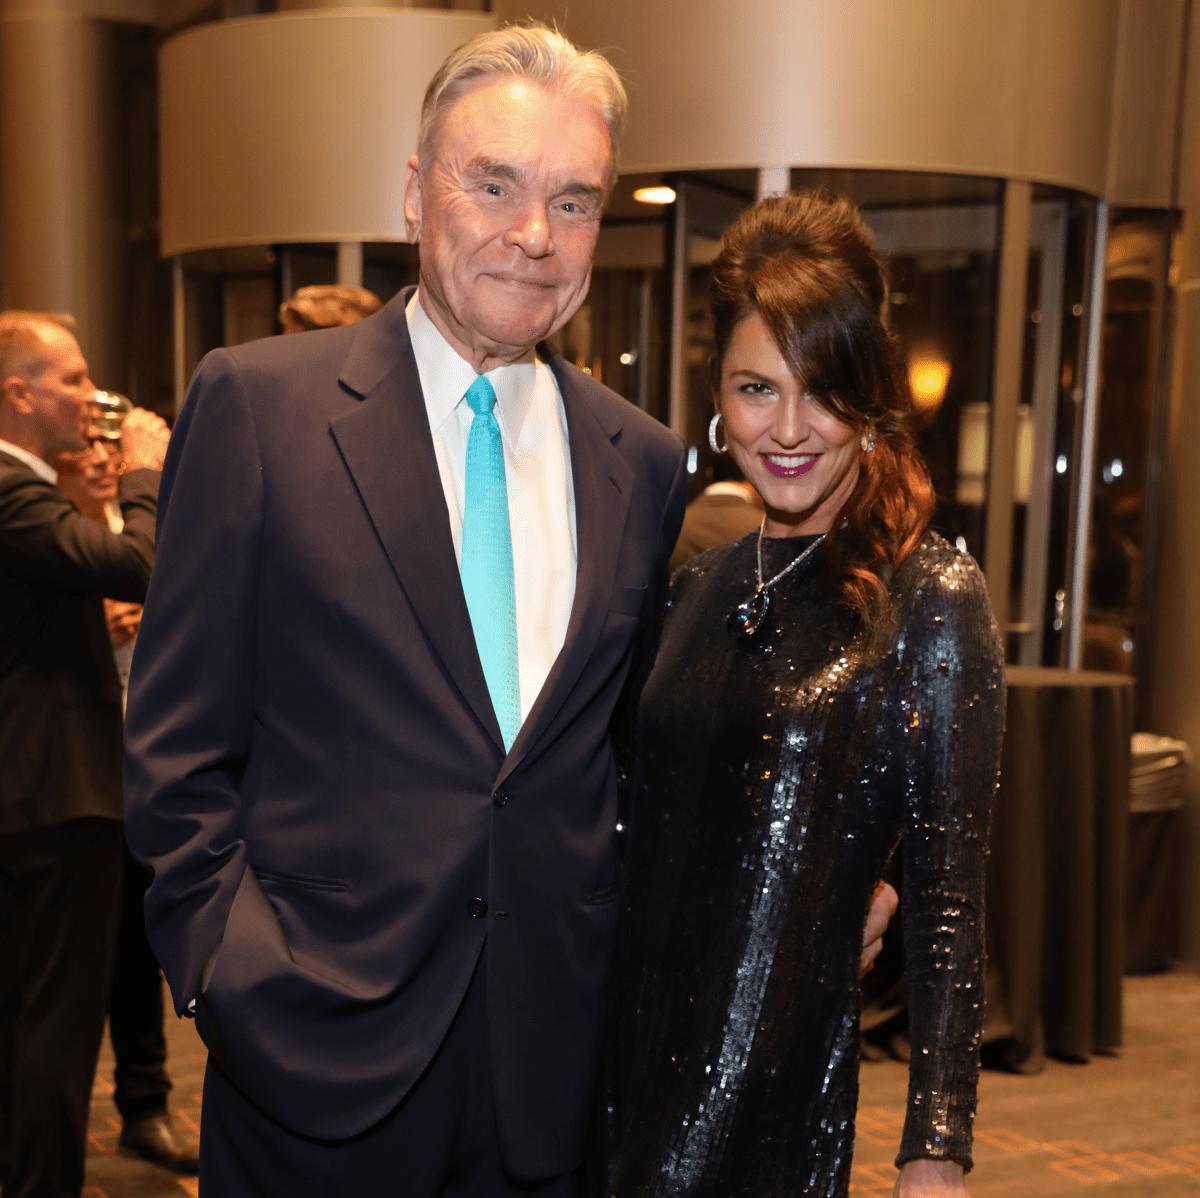 Jessica Rossman, Gordon Bethune at Una Notte de Italia gala